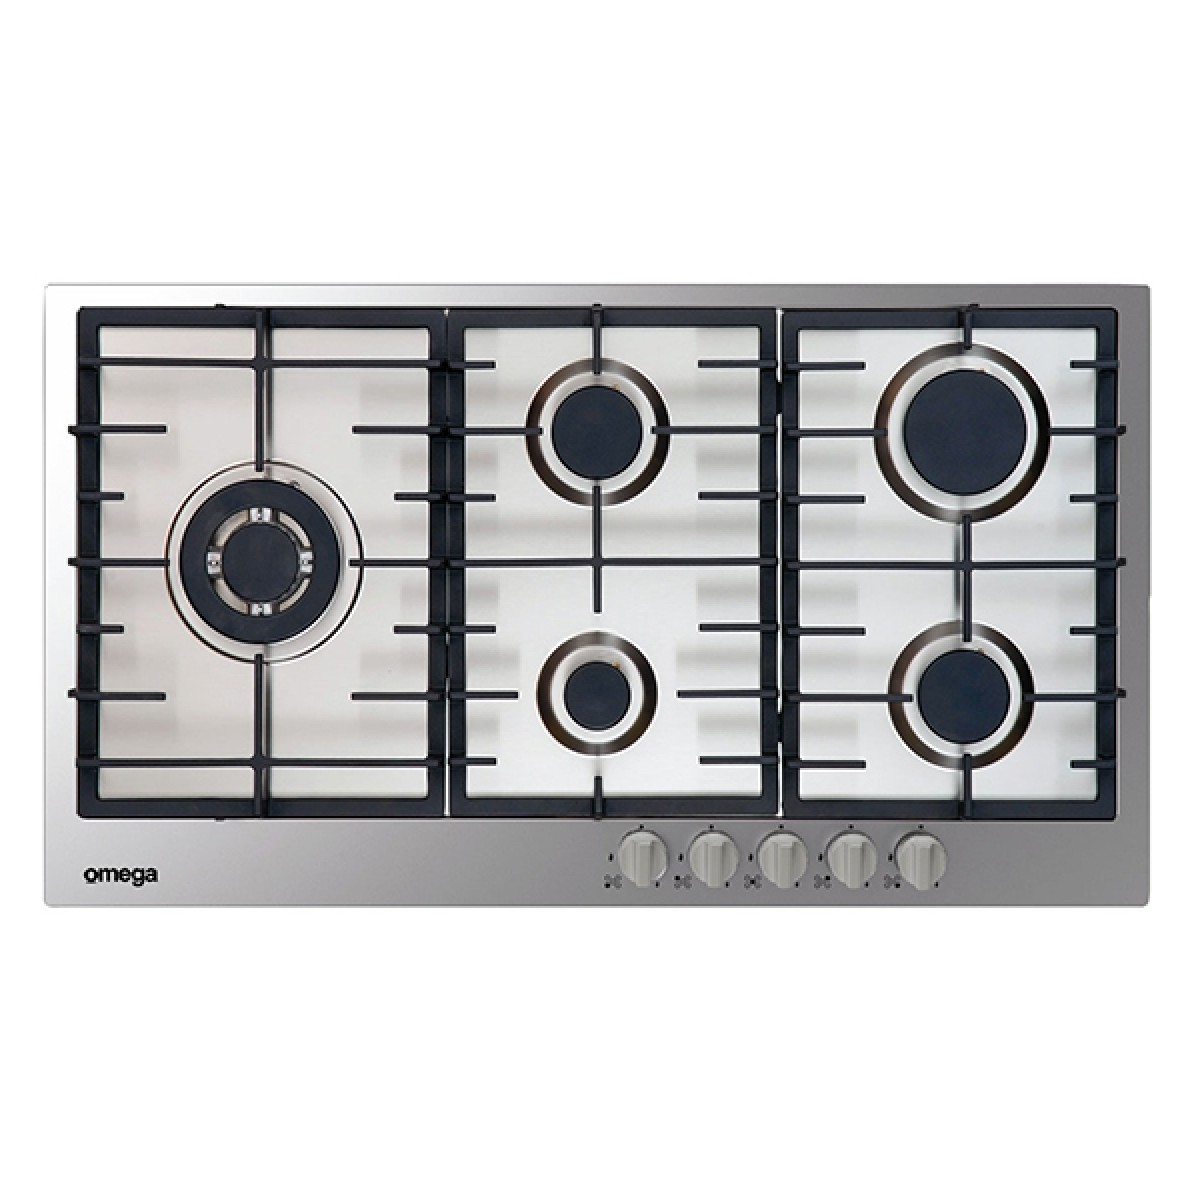 Omega OCG90FX Kitchen Cooktop